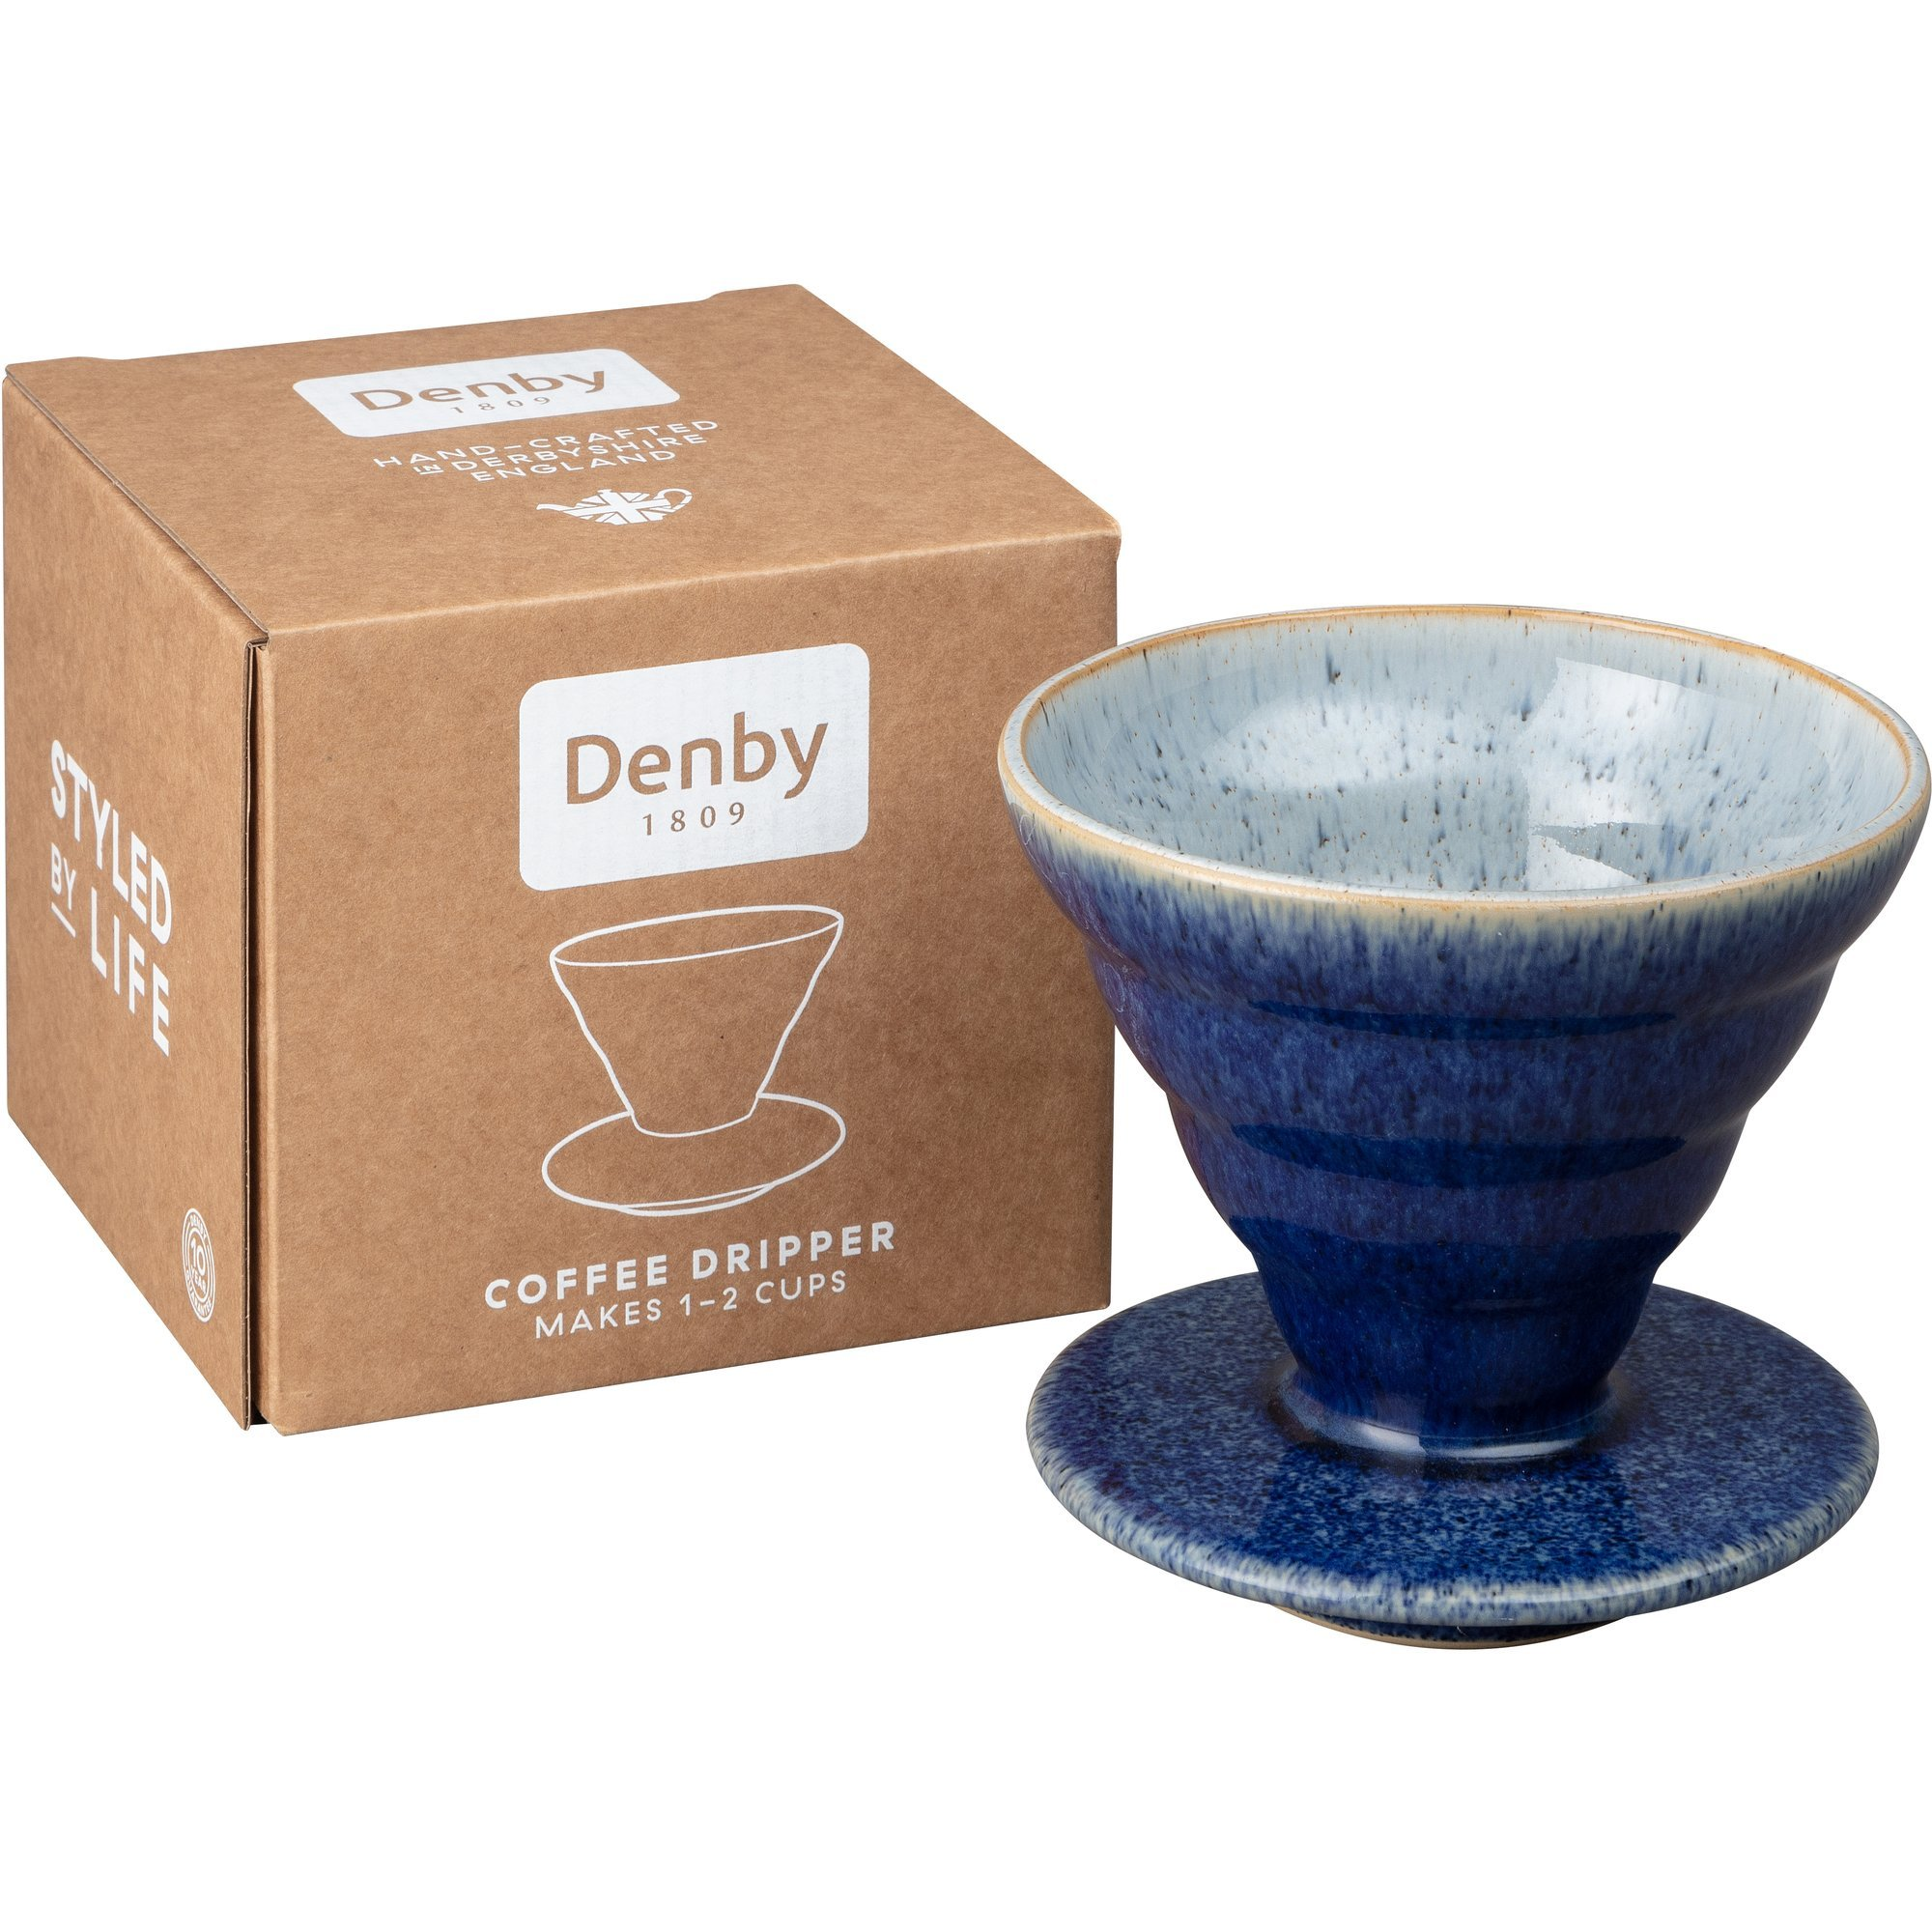 Denby Studio Grey Droppkaffebryggare